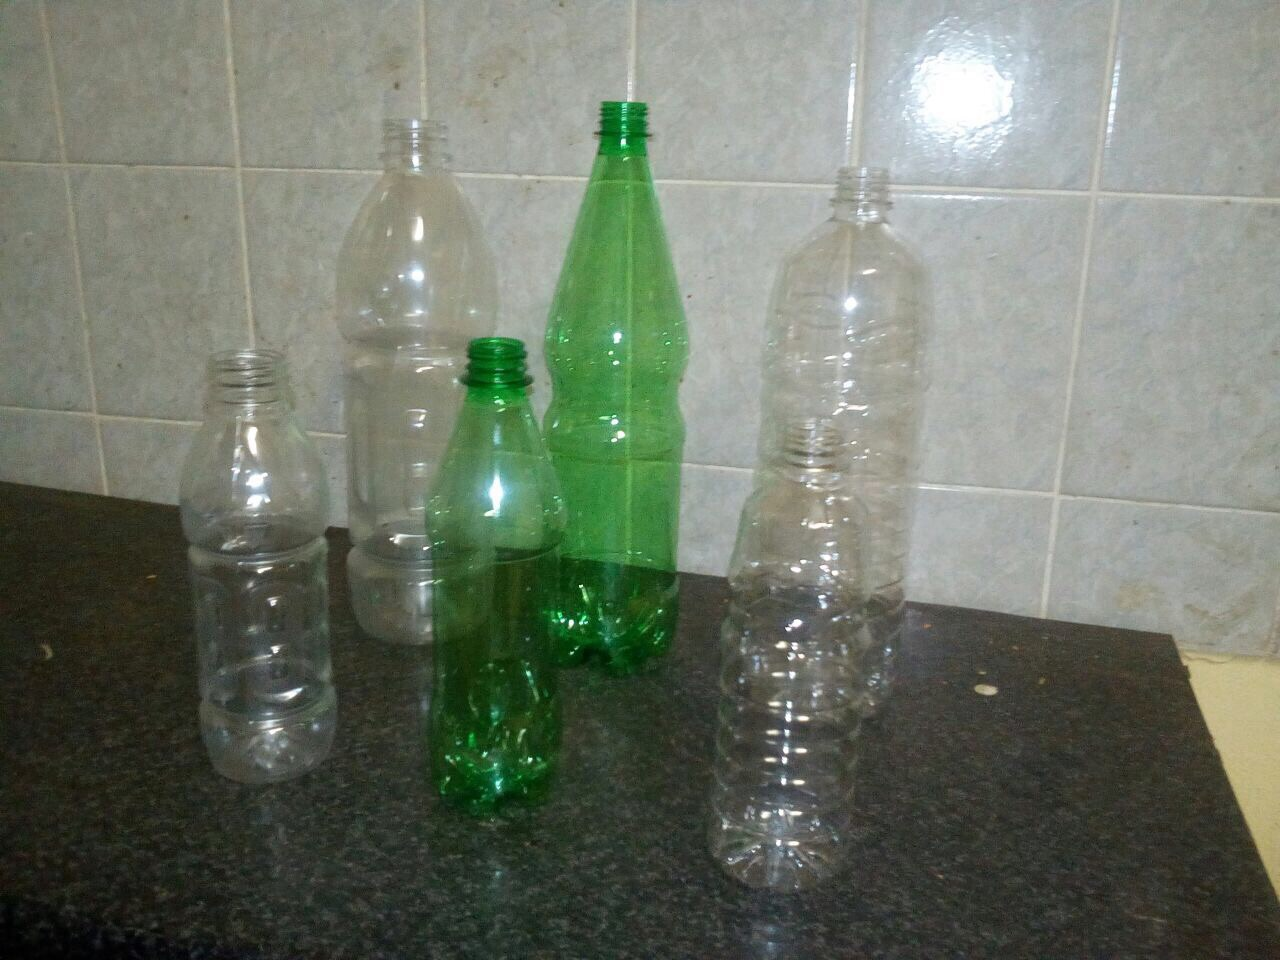 Virgin PET plastic bottles and Tetrapak for sale